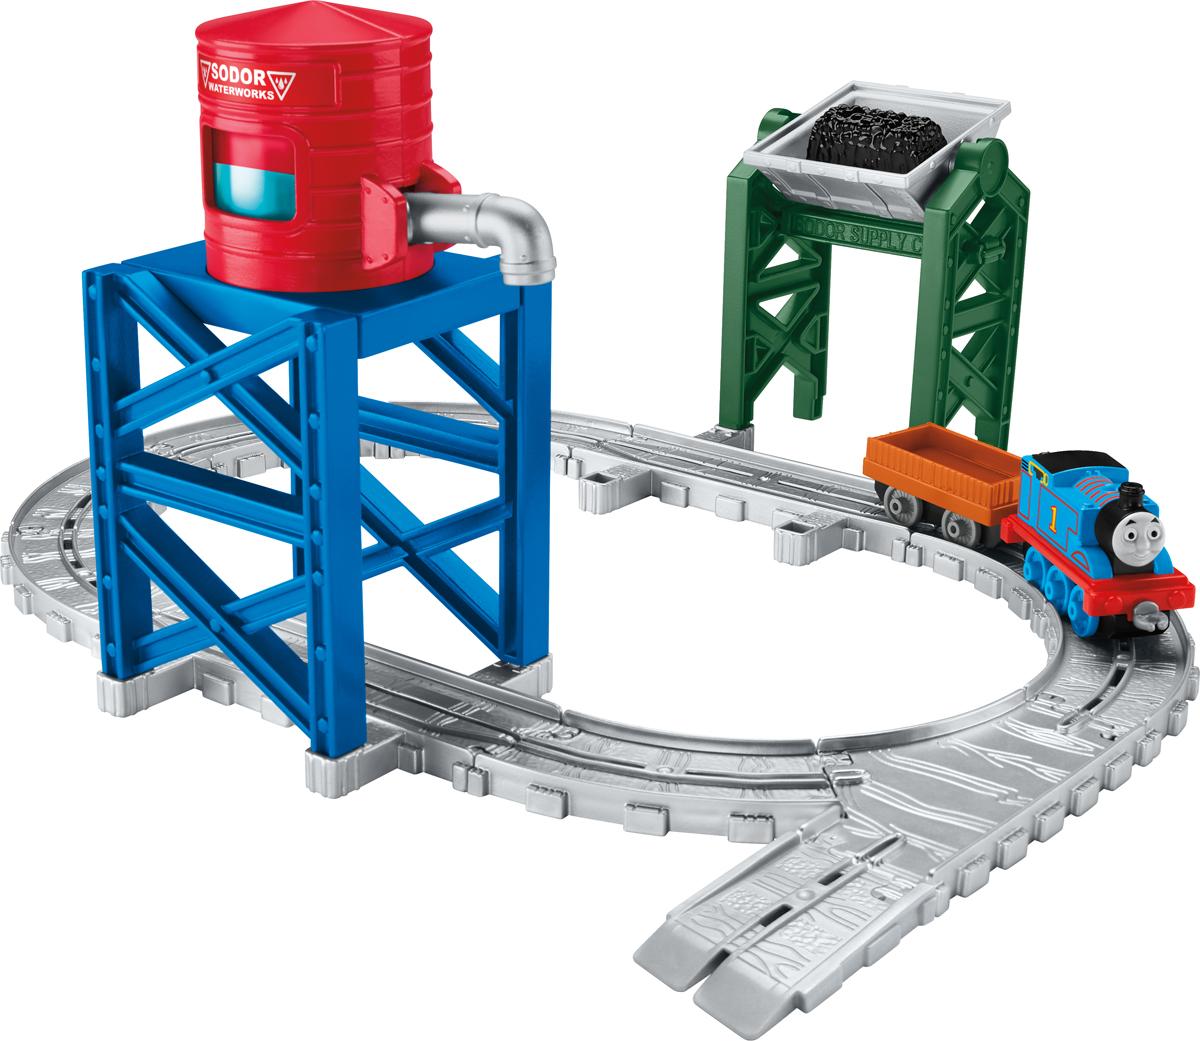 Thomas & Friends Железная дорога Заправка паровозов